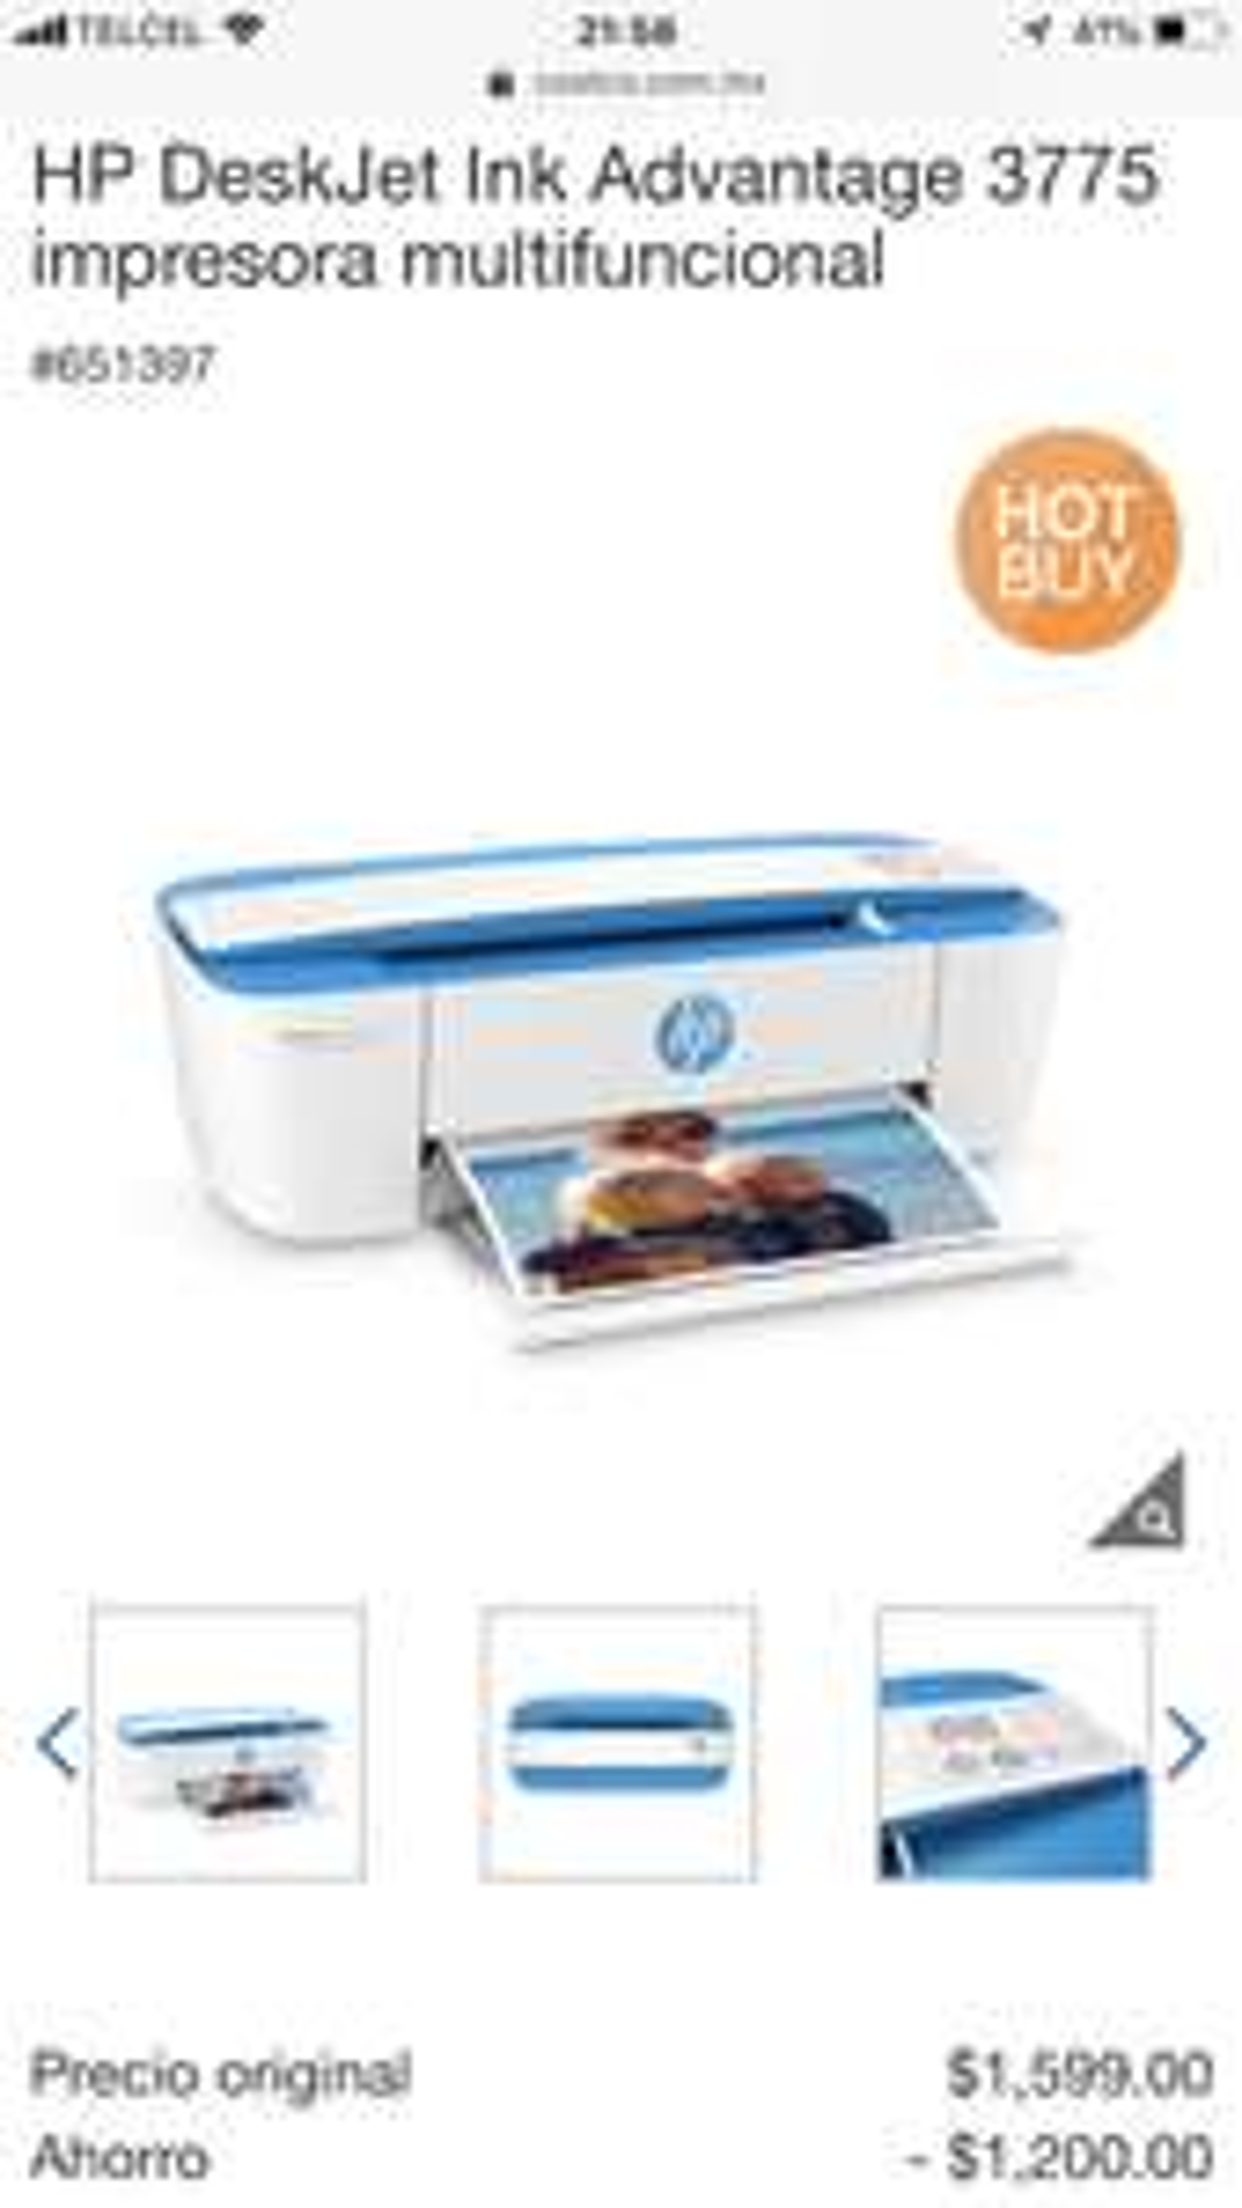 Costco: HP DeskJet Ink Advantage 3775 impresora multifuncional